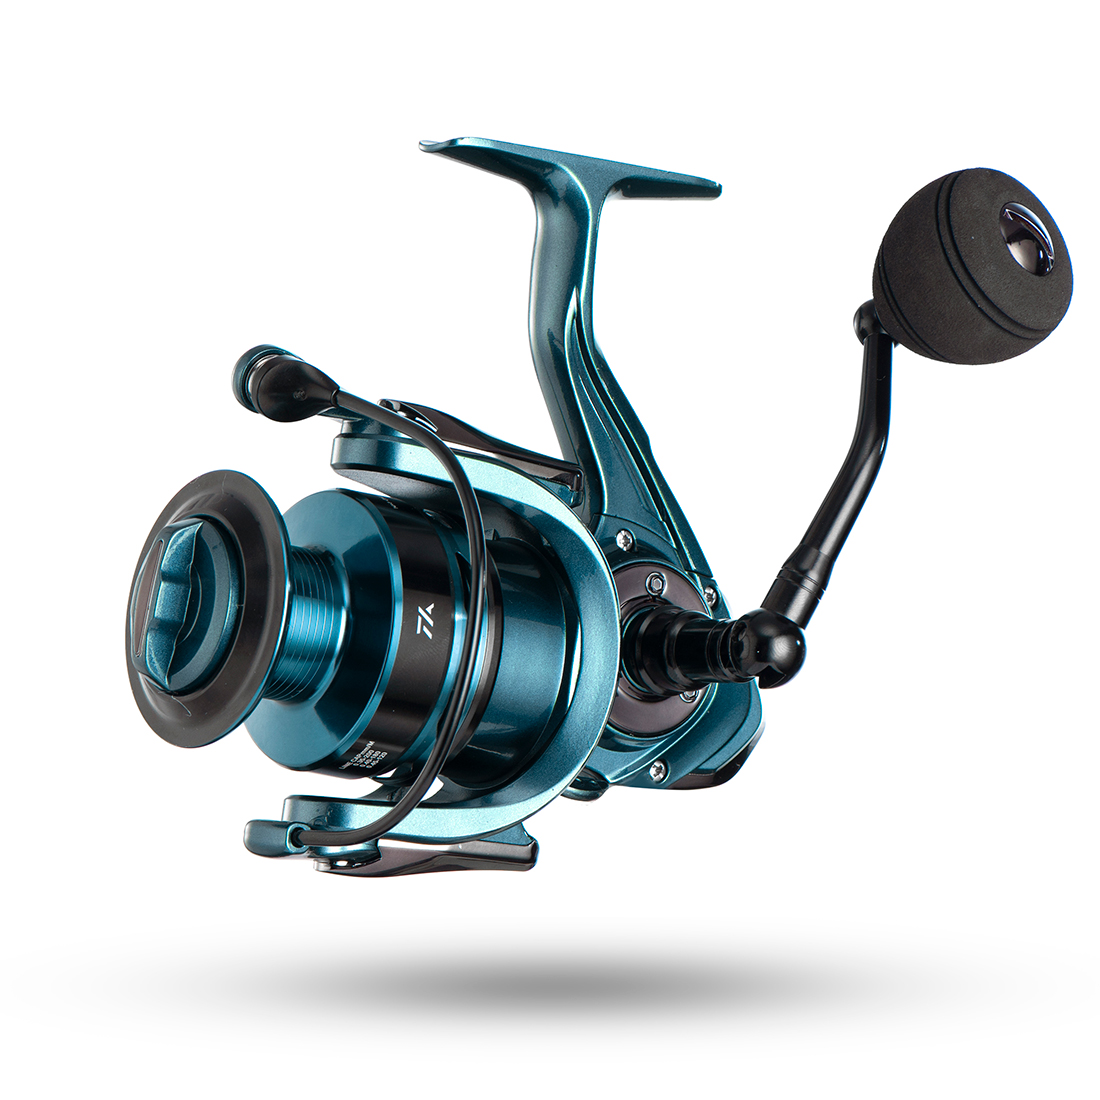 Fishing Reel 14+1BB Deep Spool 5.5:1 4.7:1 Gear Ratio High Speed Spinning Reel Casting reel Carp For Saltwater 5000 D deep cup